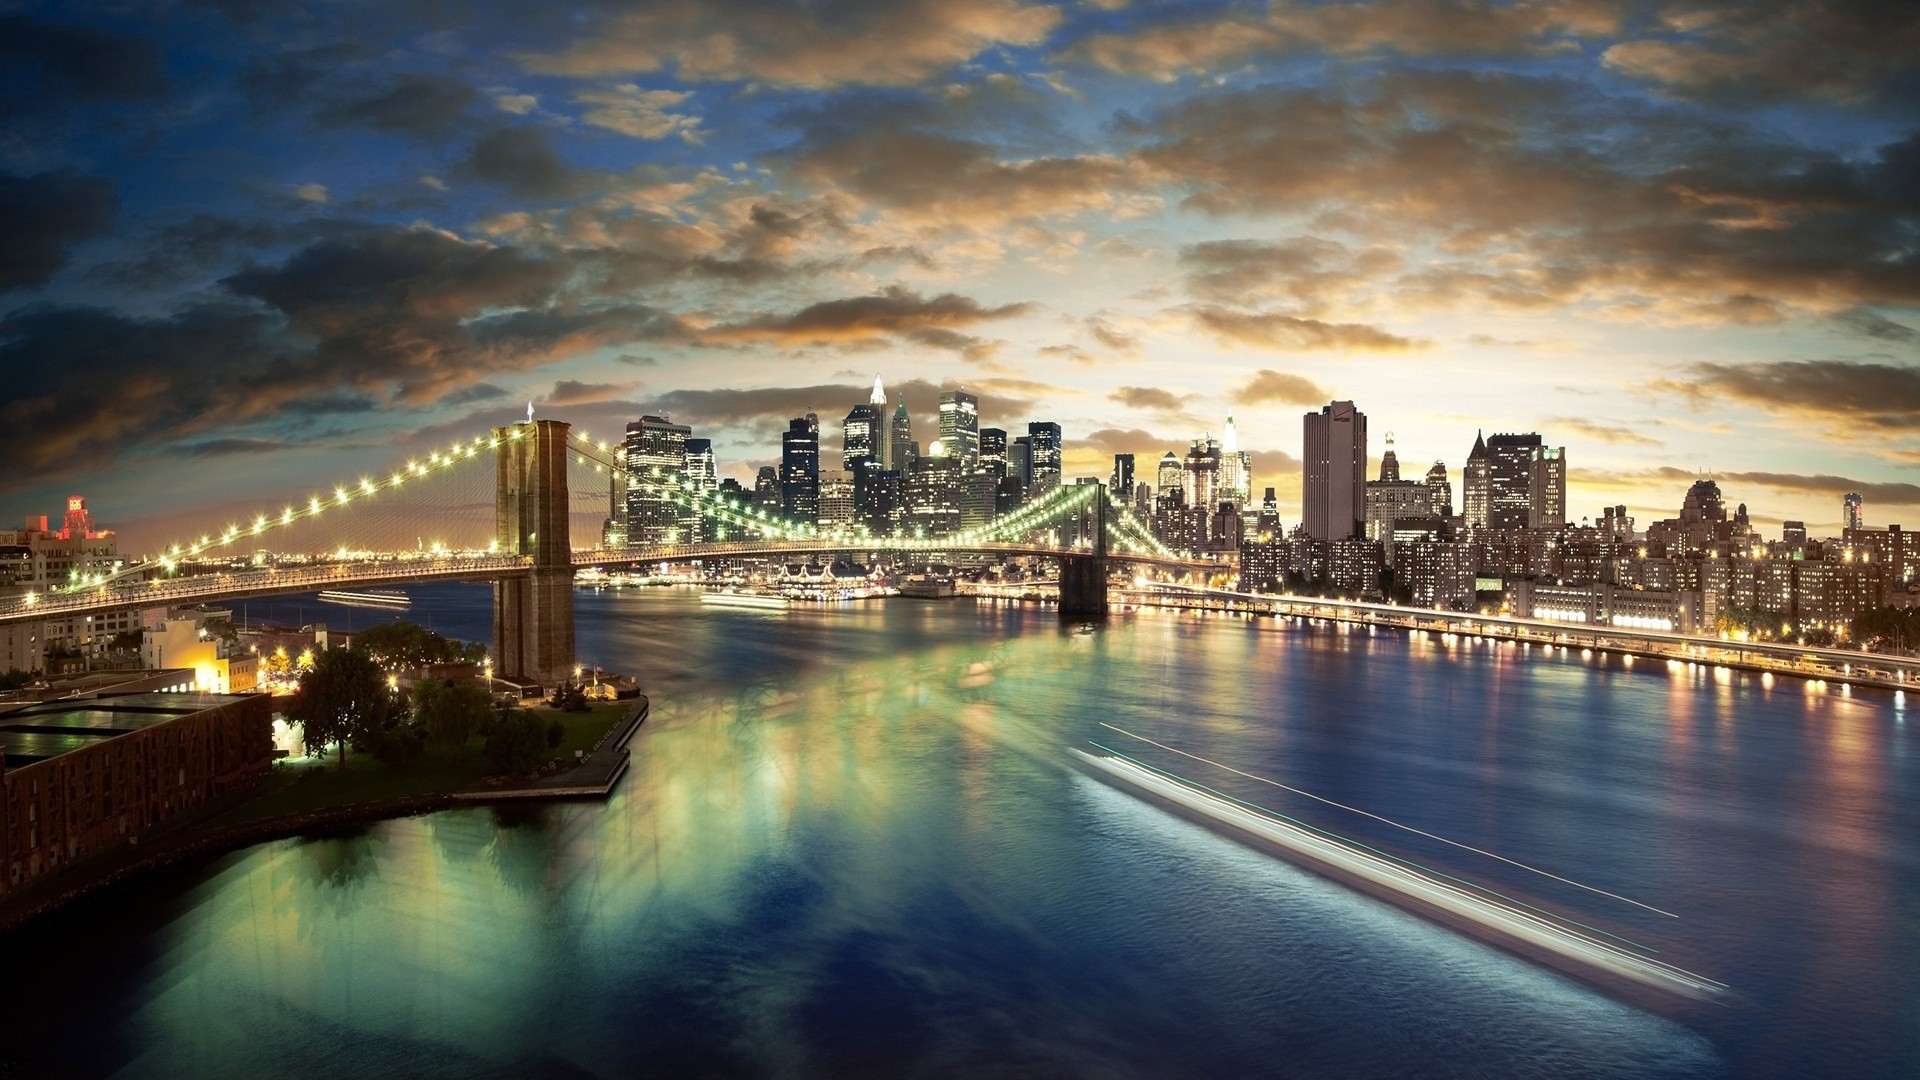 HD City Skyline Wallpapers